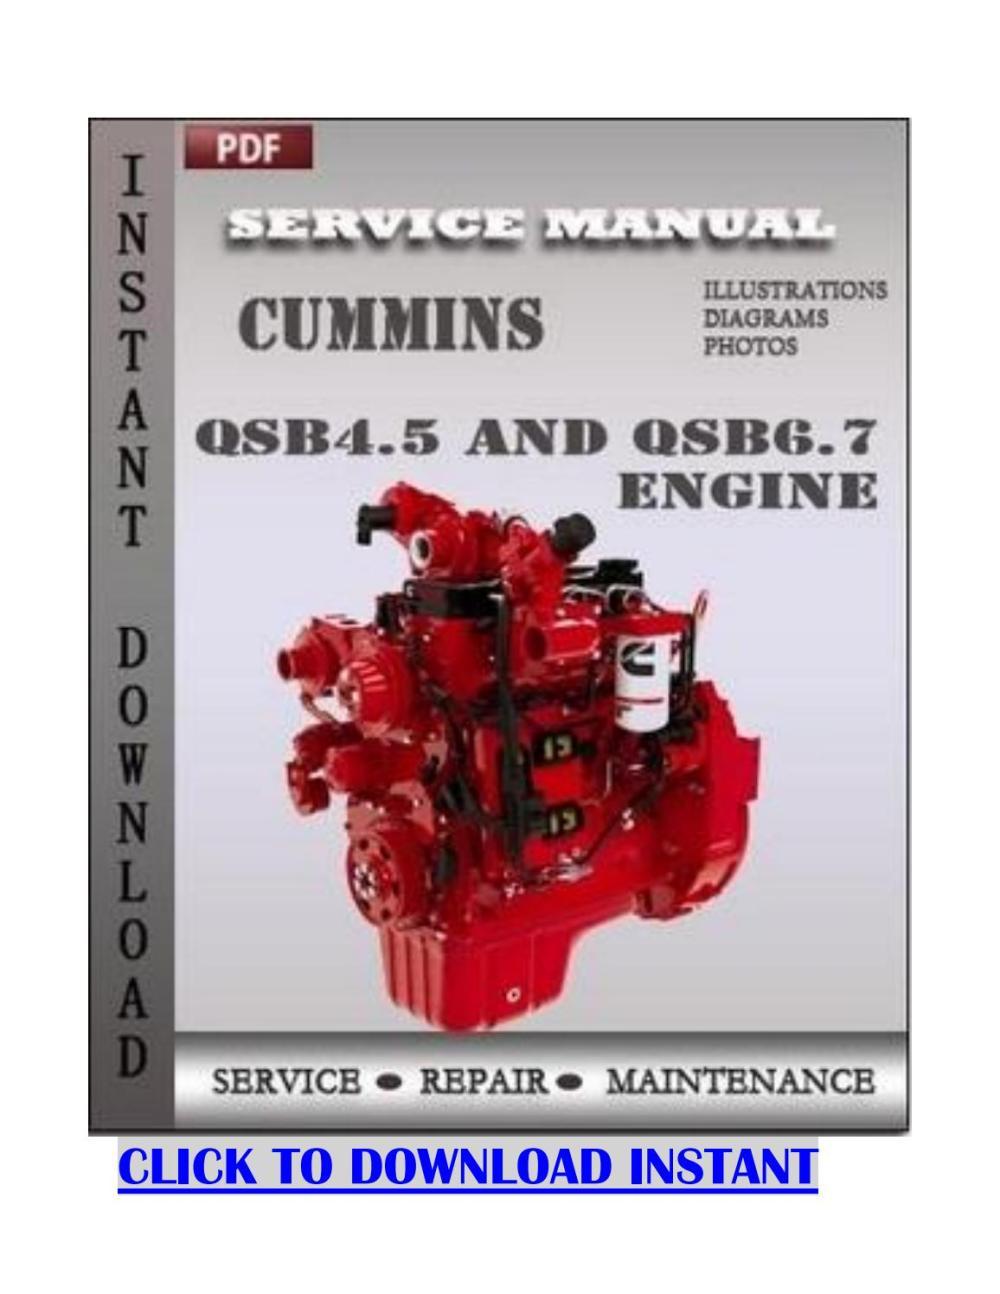 medium resolution of 7 engine operation maintenance service manual